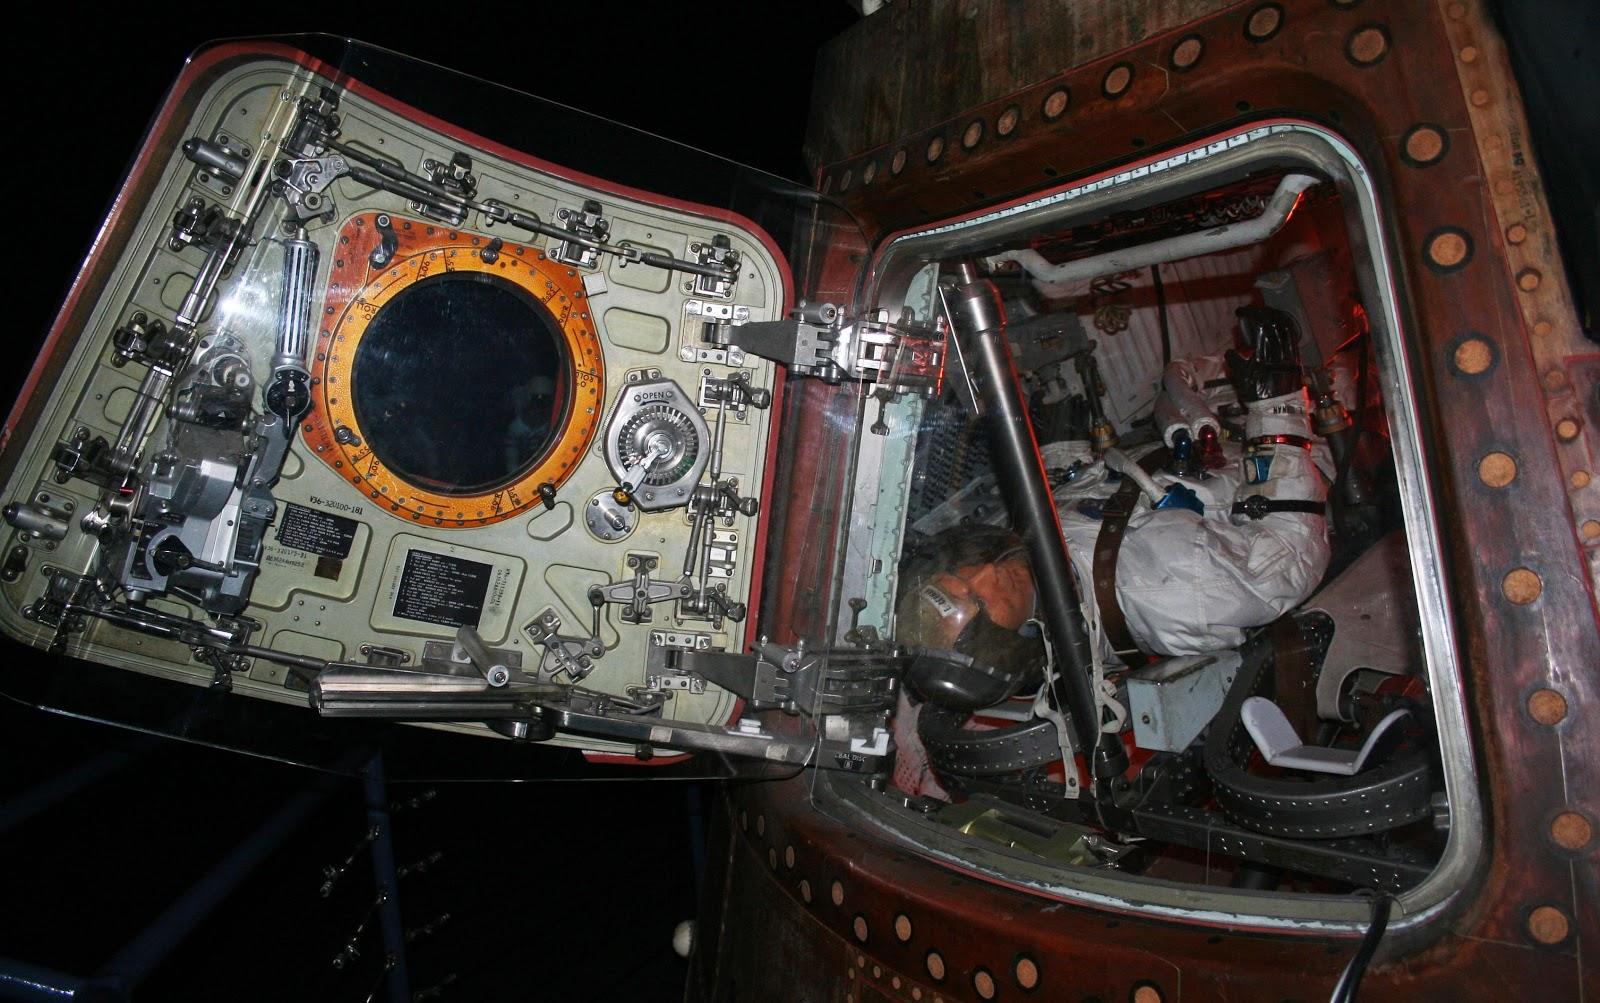 apollo 17 capsule - photo #16